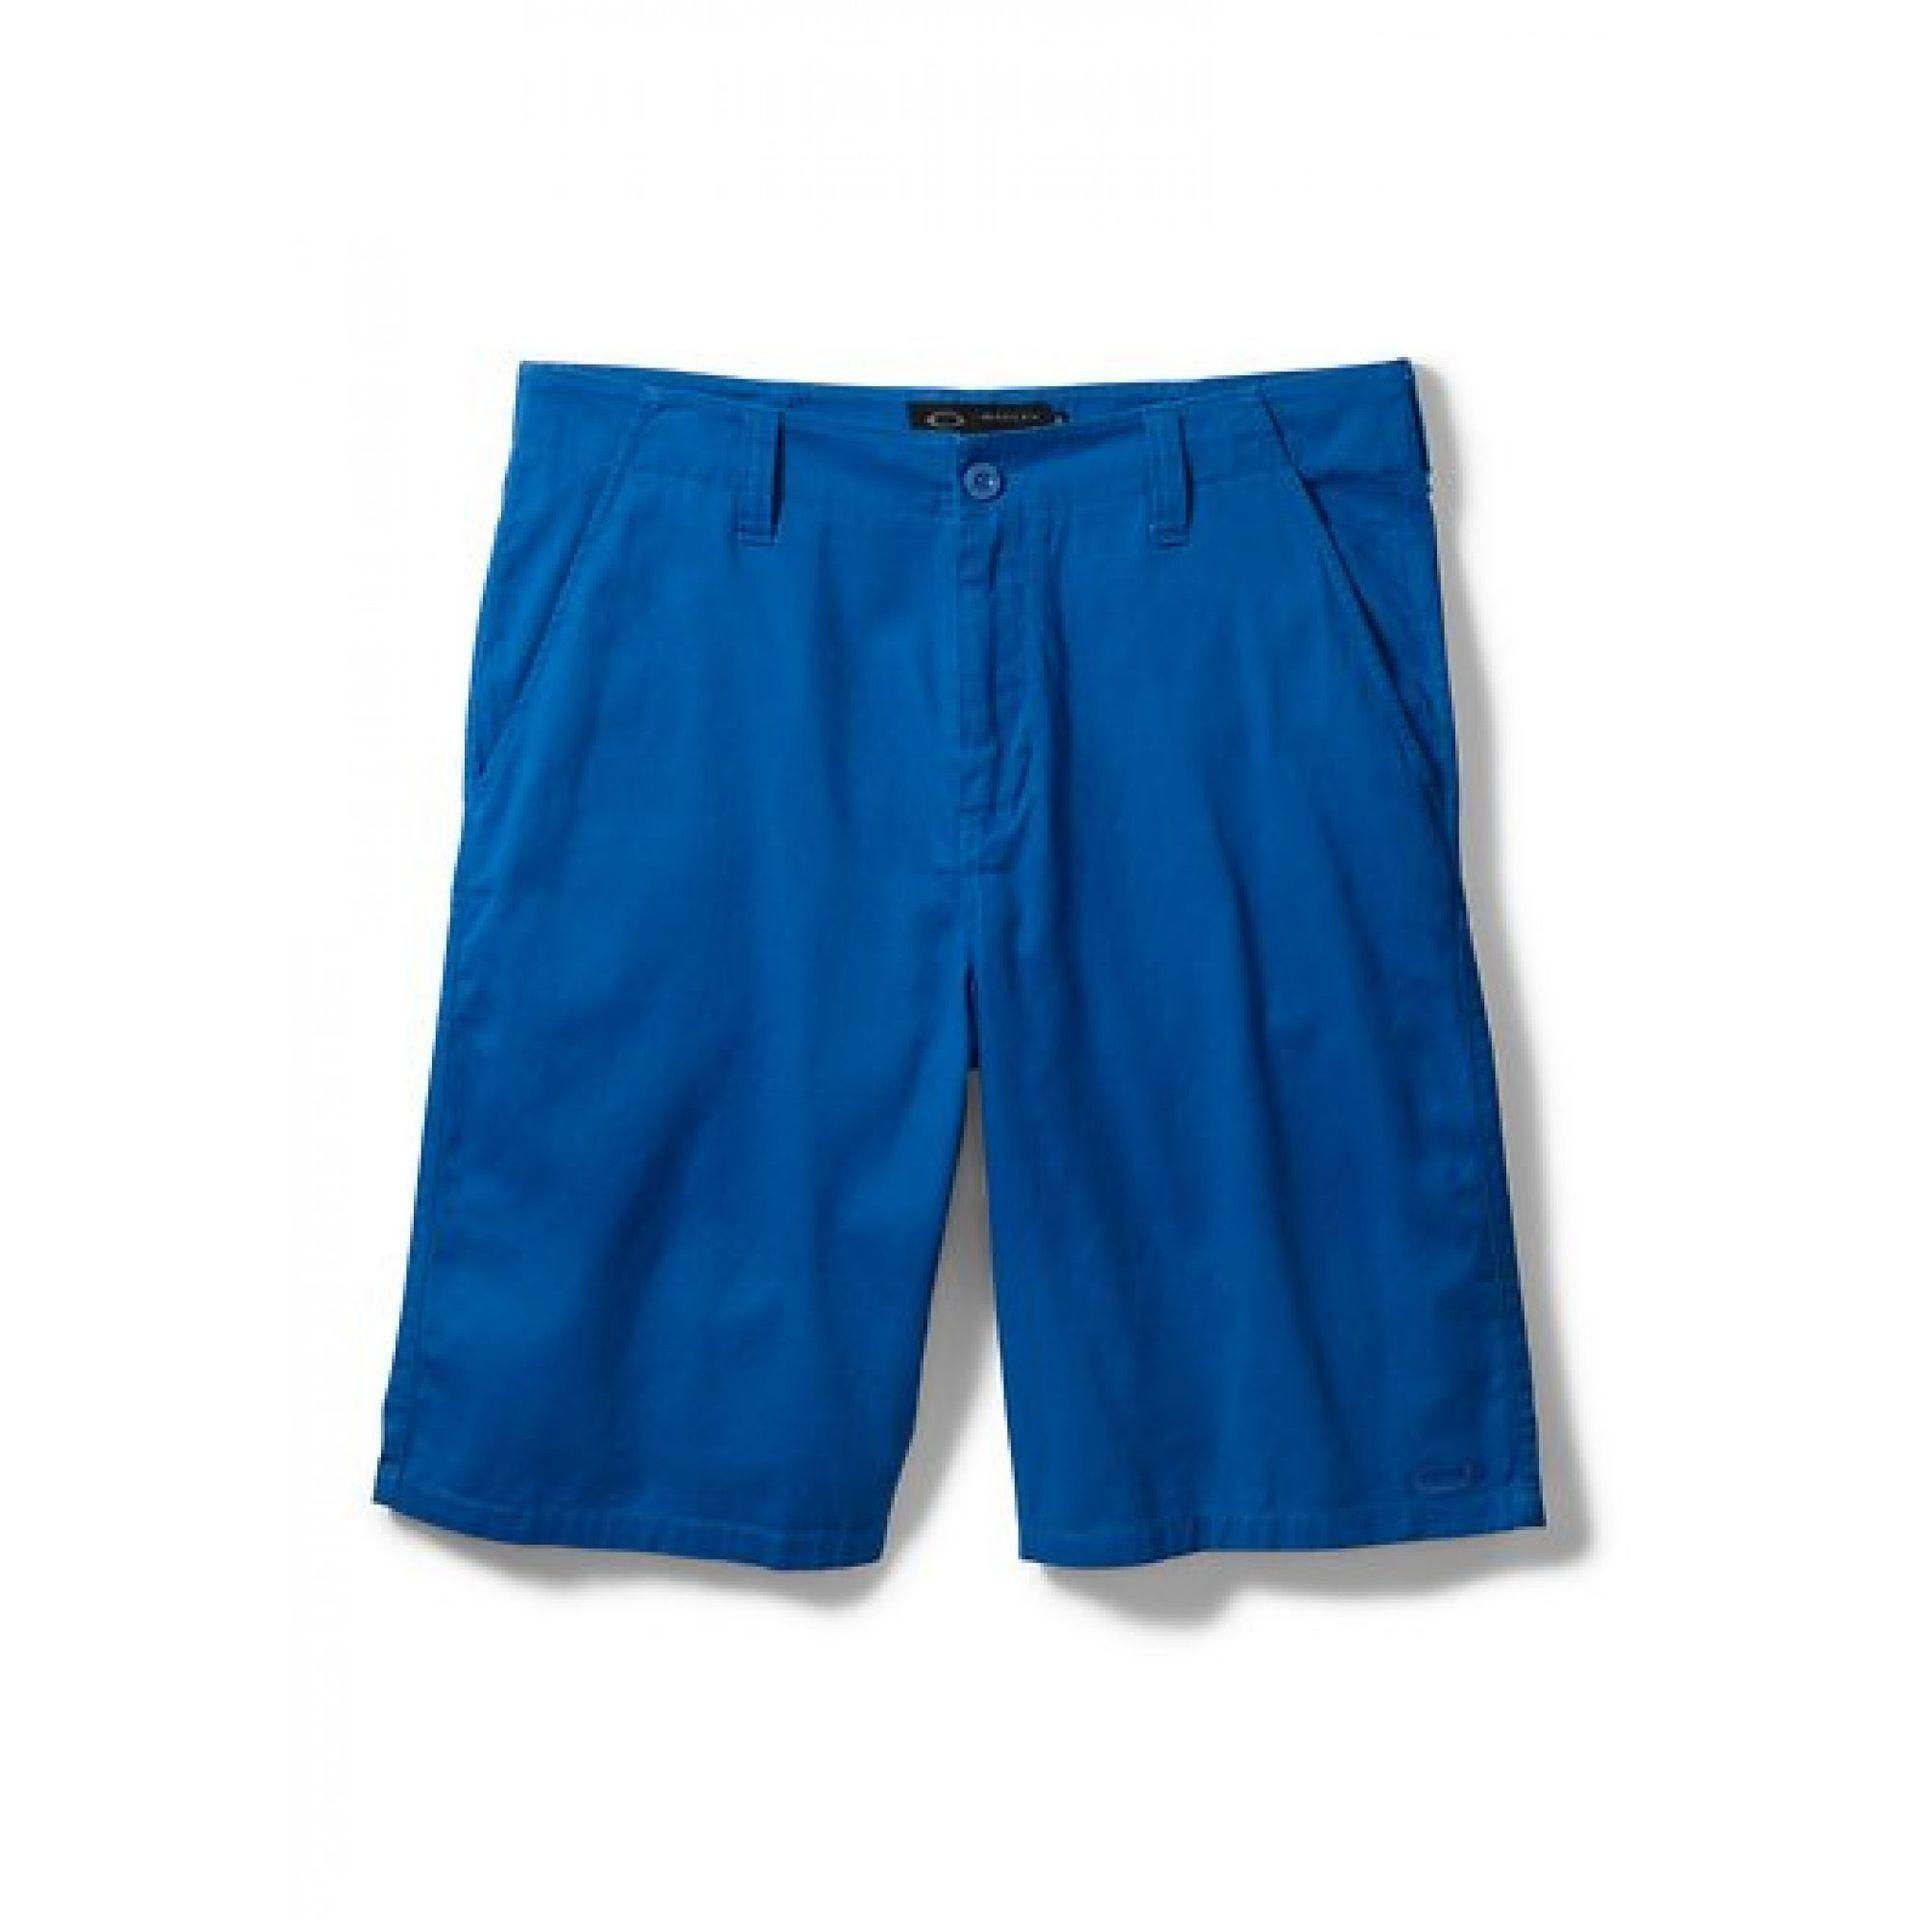 Spodenki Oakley  Represent Shorts Electric Blue 2